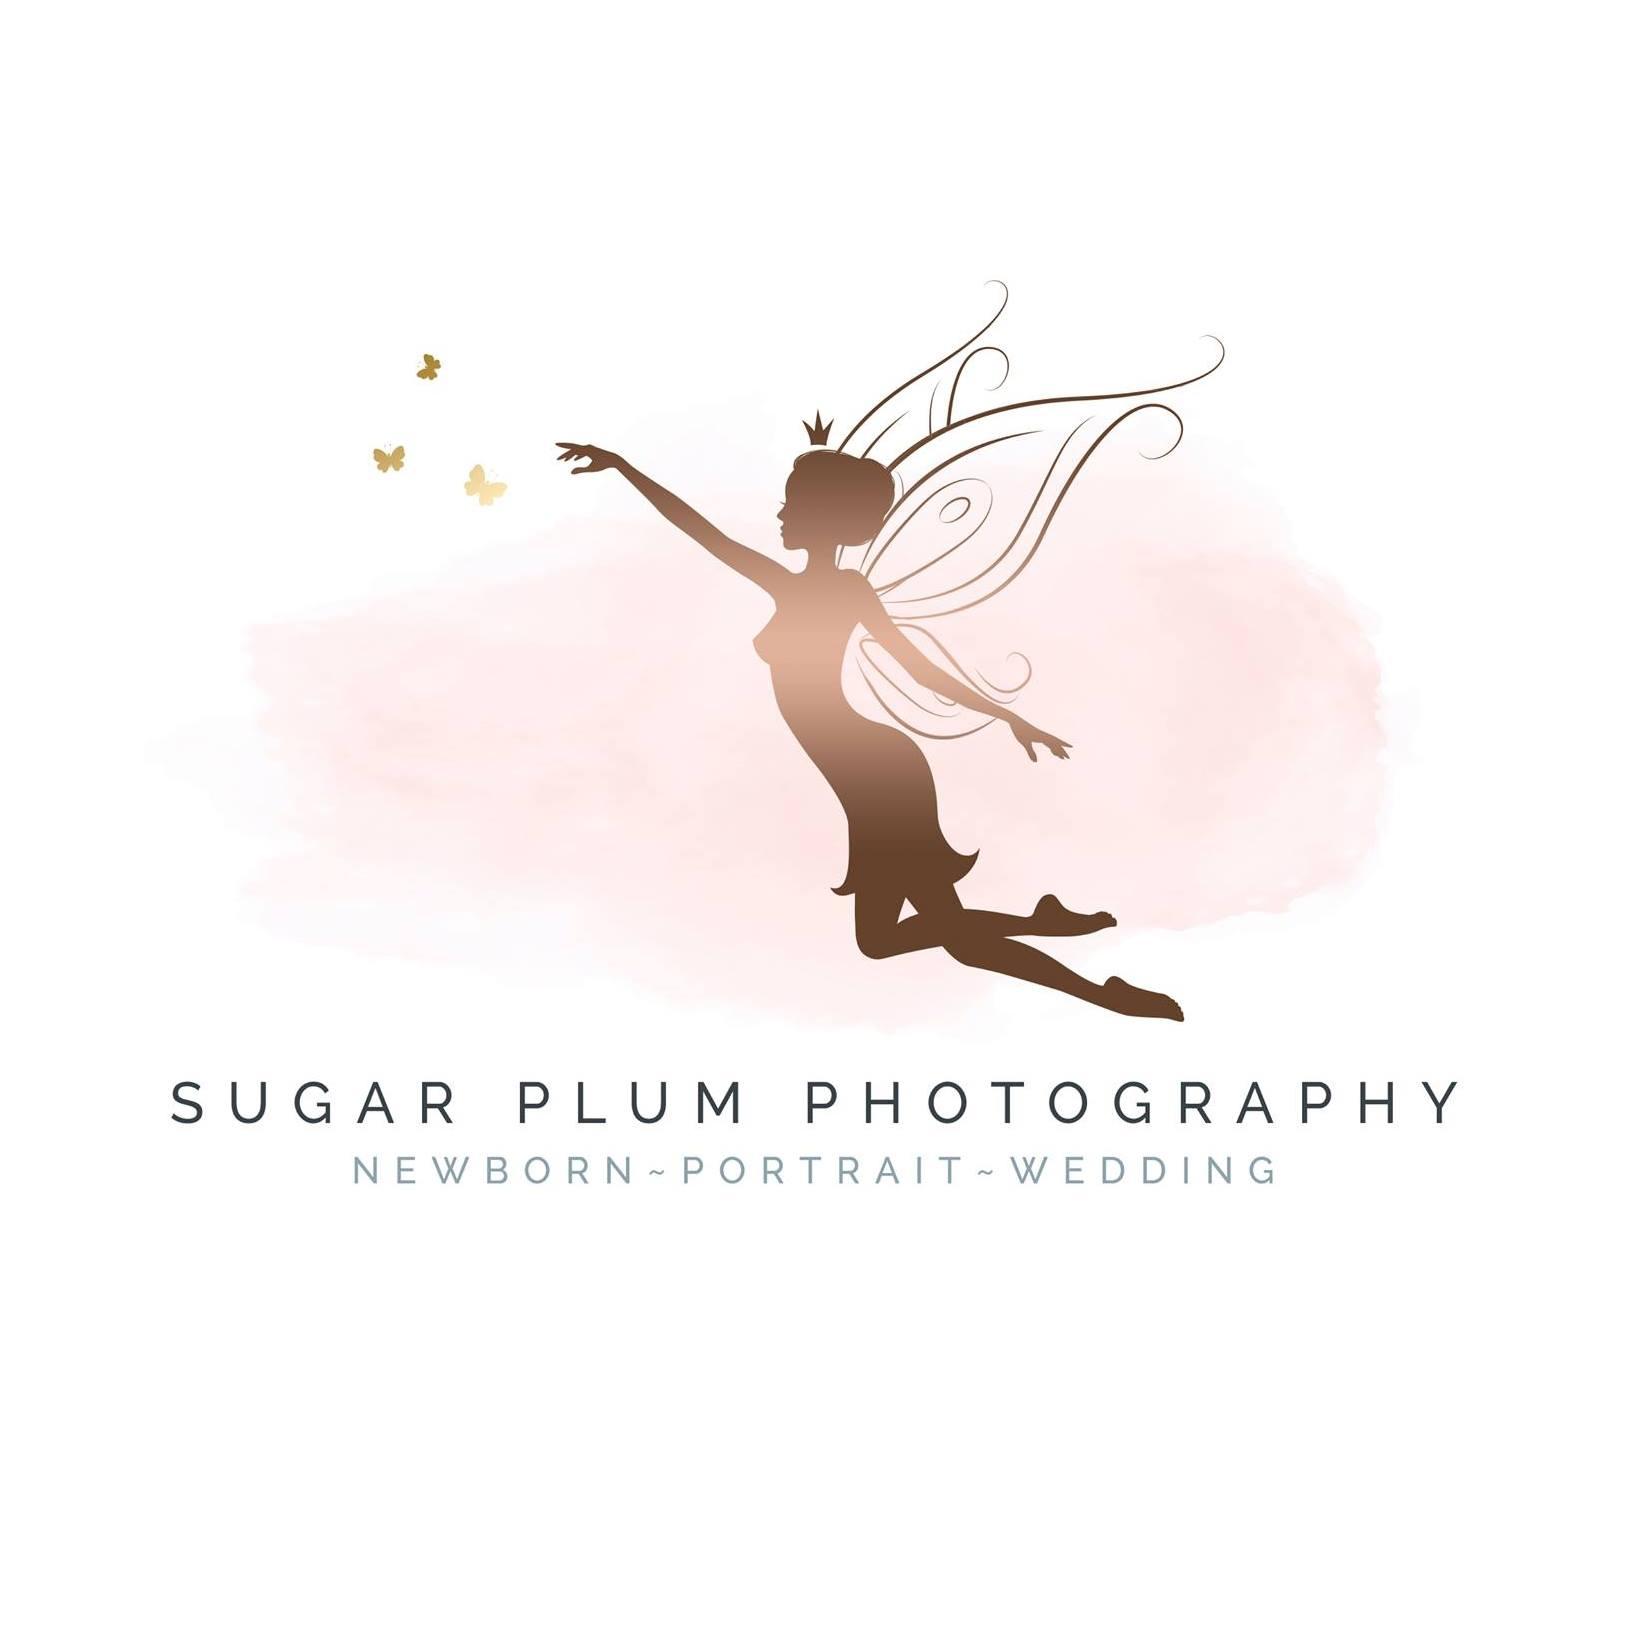 Sugar Plum Photography